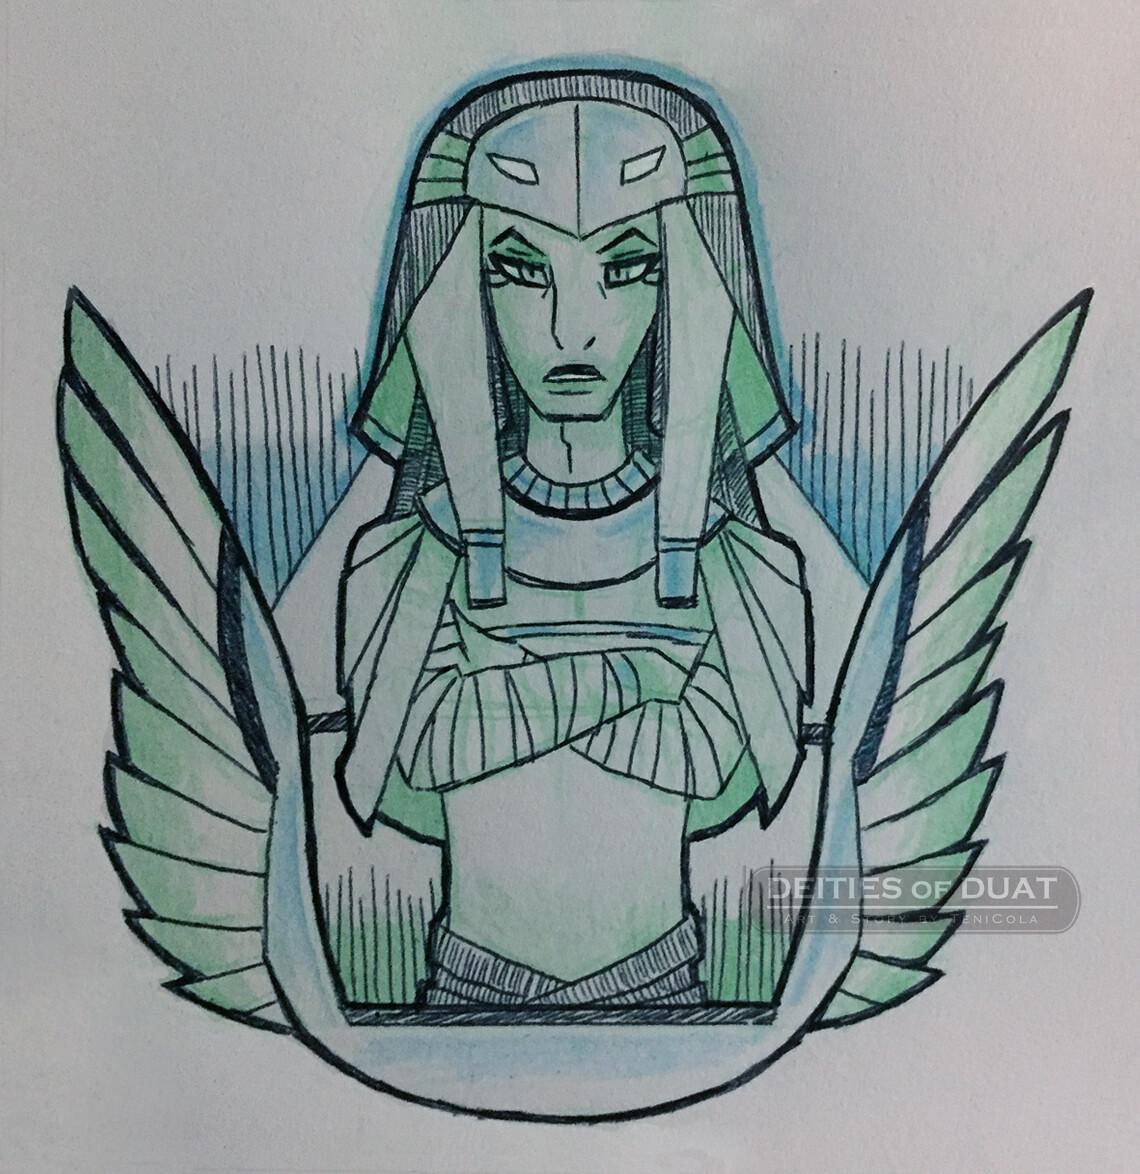 SOKAR -- The God of tombs, the underworld, and rejuvenation.